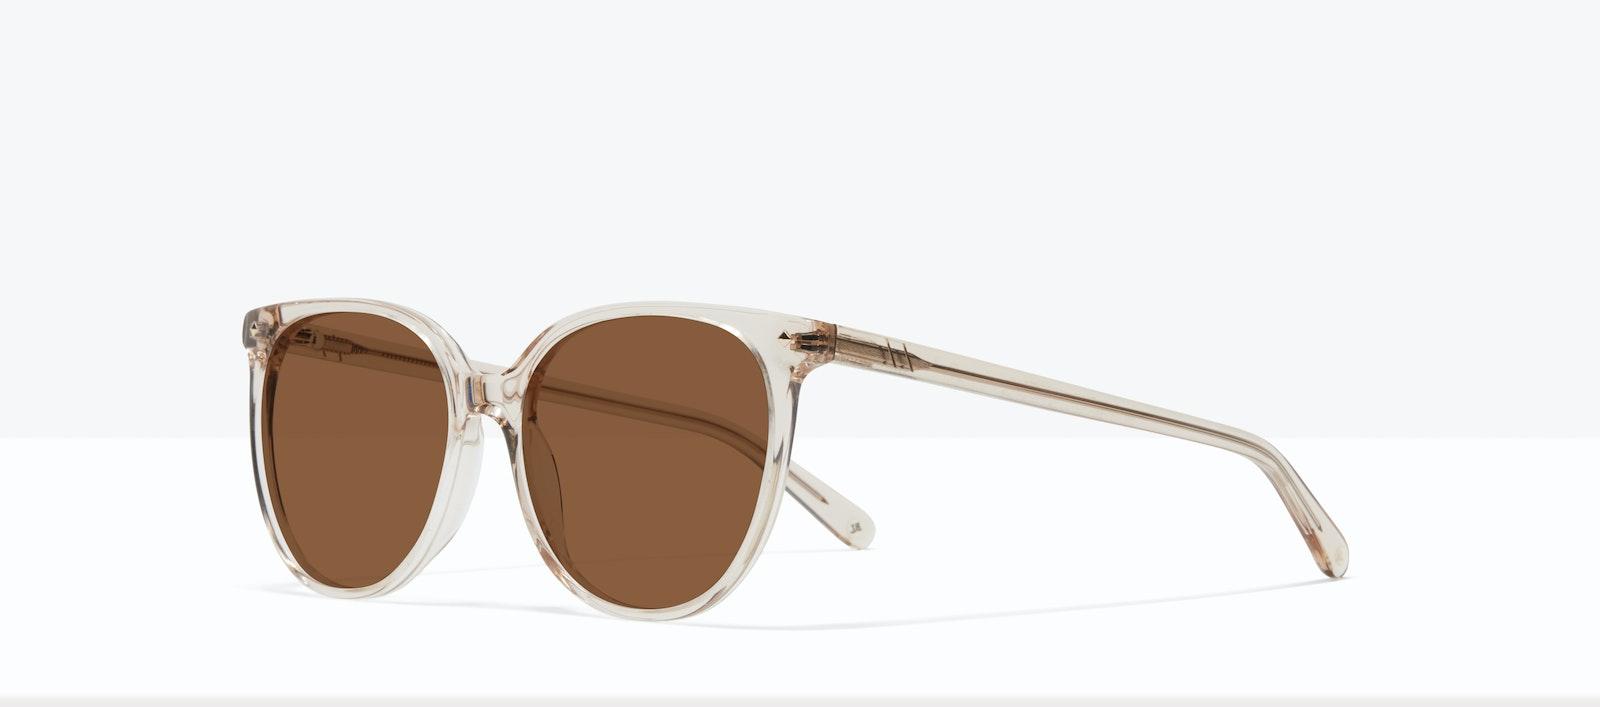 Affordable Fashion Glasses Round Sunglasses Women Area L Blond Tilt